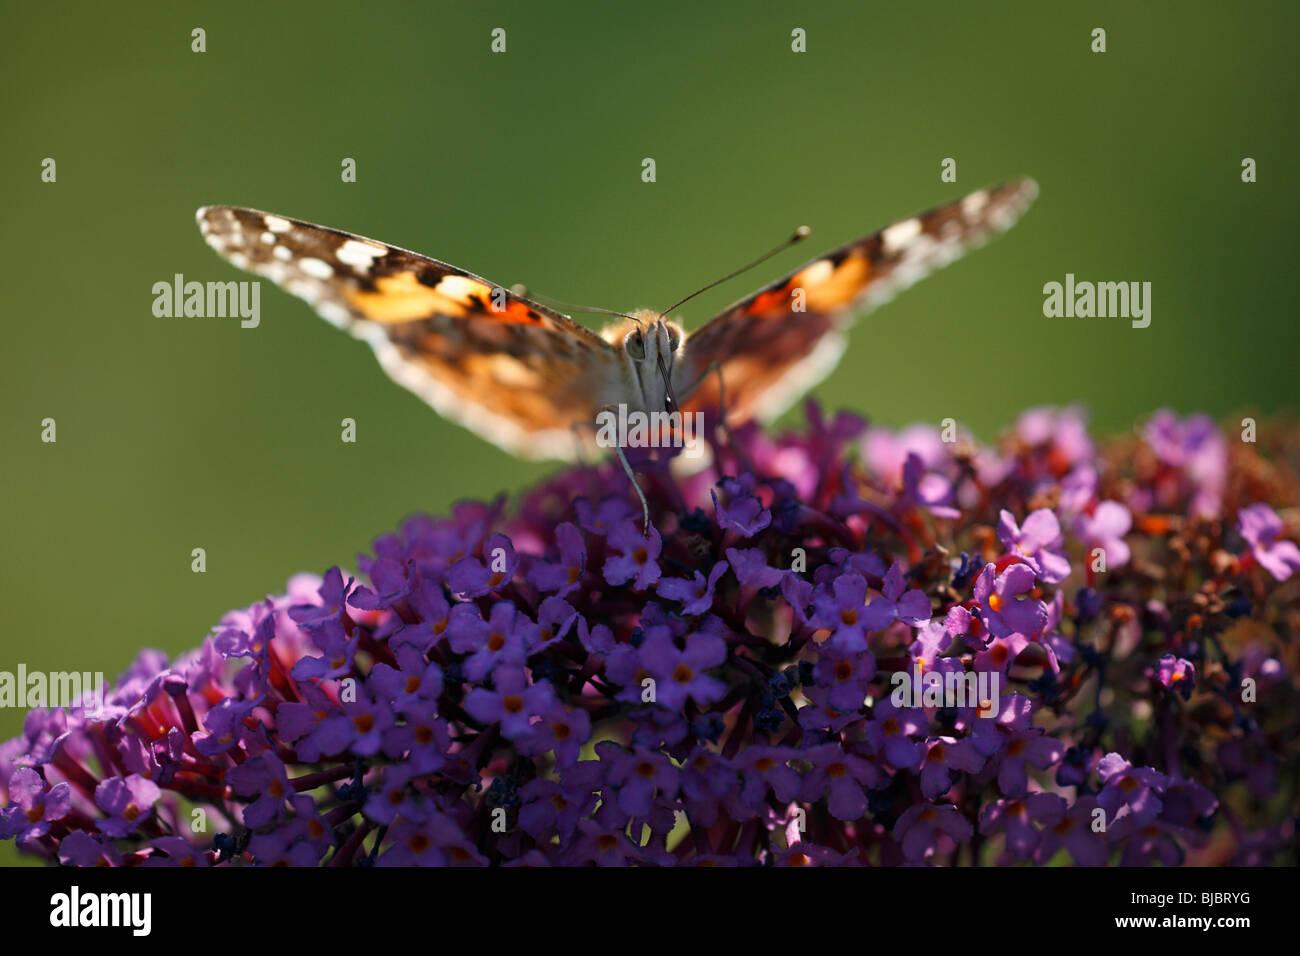 Painted Lady butterfly (Vanessa cardui), feeding on Buddleia blossom (Buddleia davidii), in garden, Germany - Stock Image